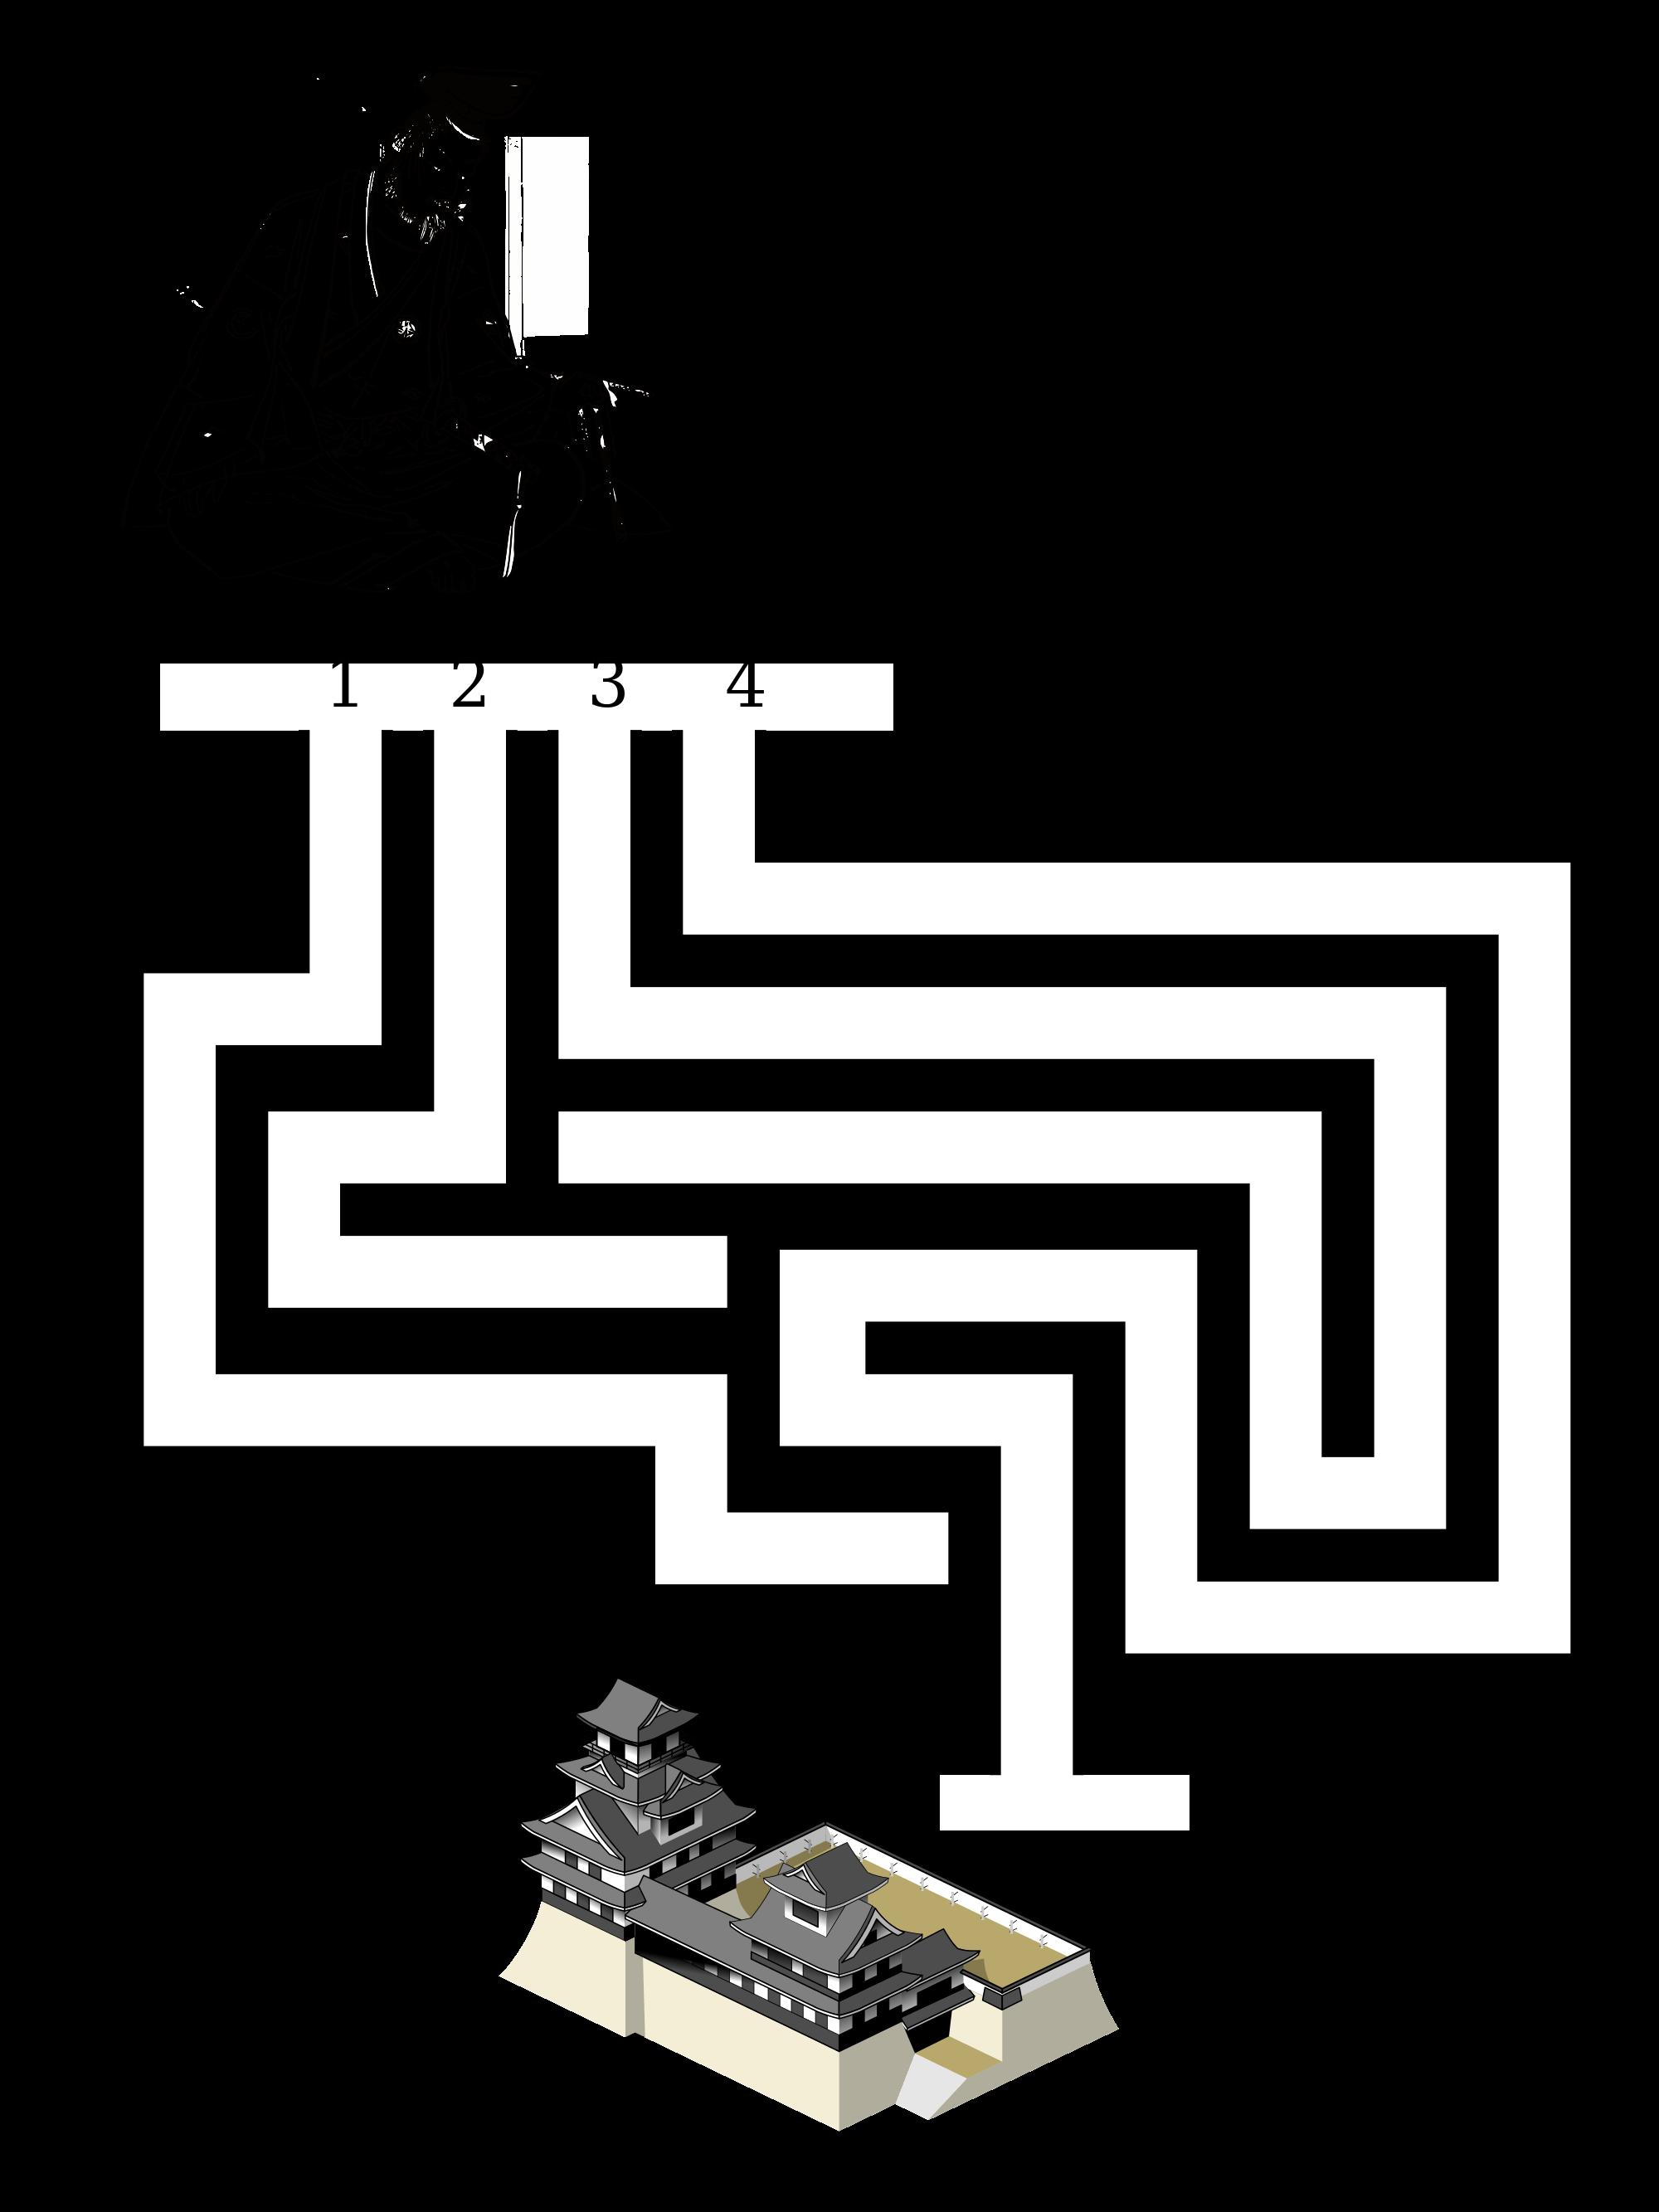 Funky printable mazes kindergarten. Maze clipart medium difficulty